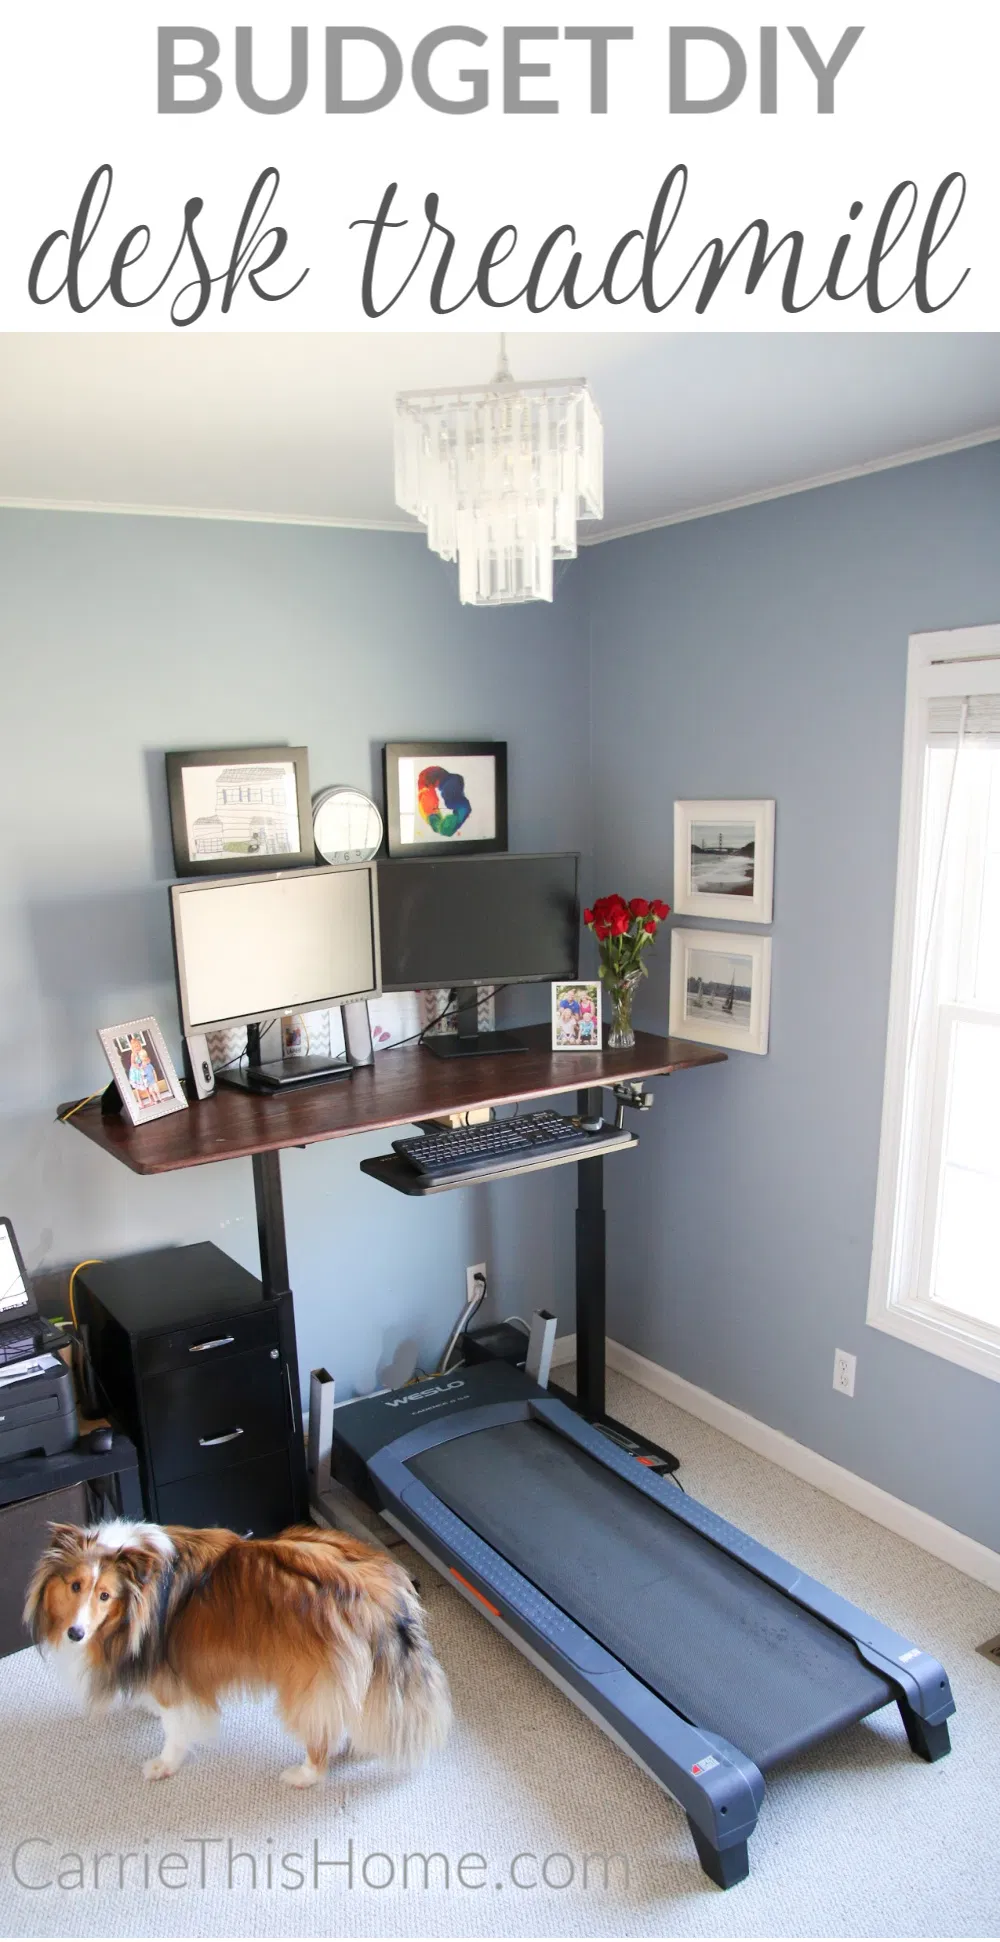 Diy Desk Treadmill Carrie This Home In 2020 Diy Desk Diy